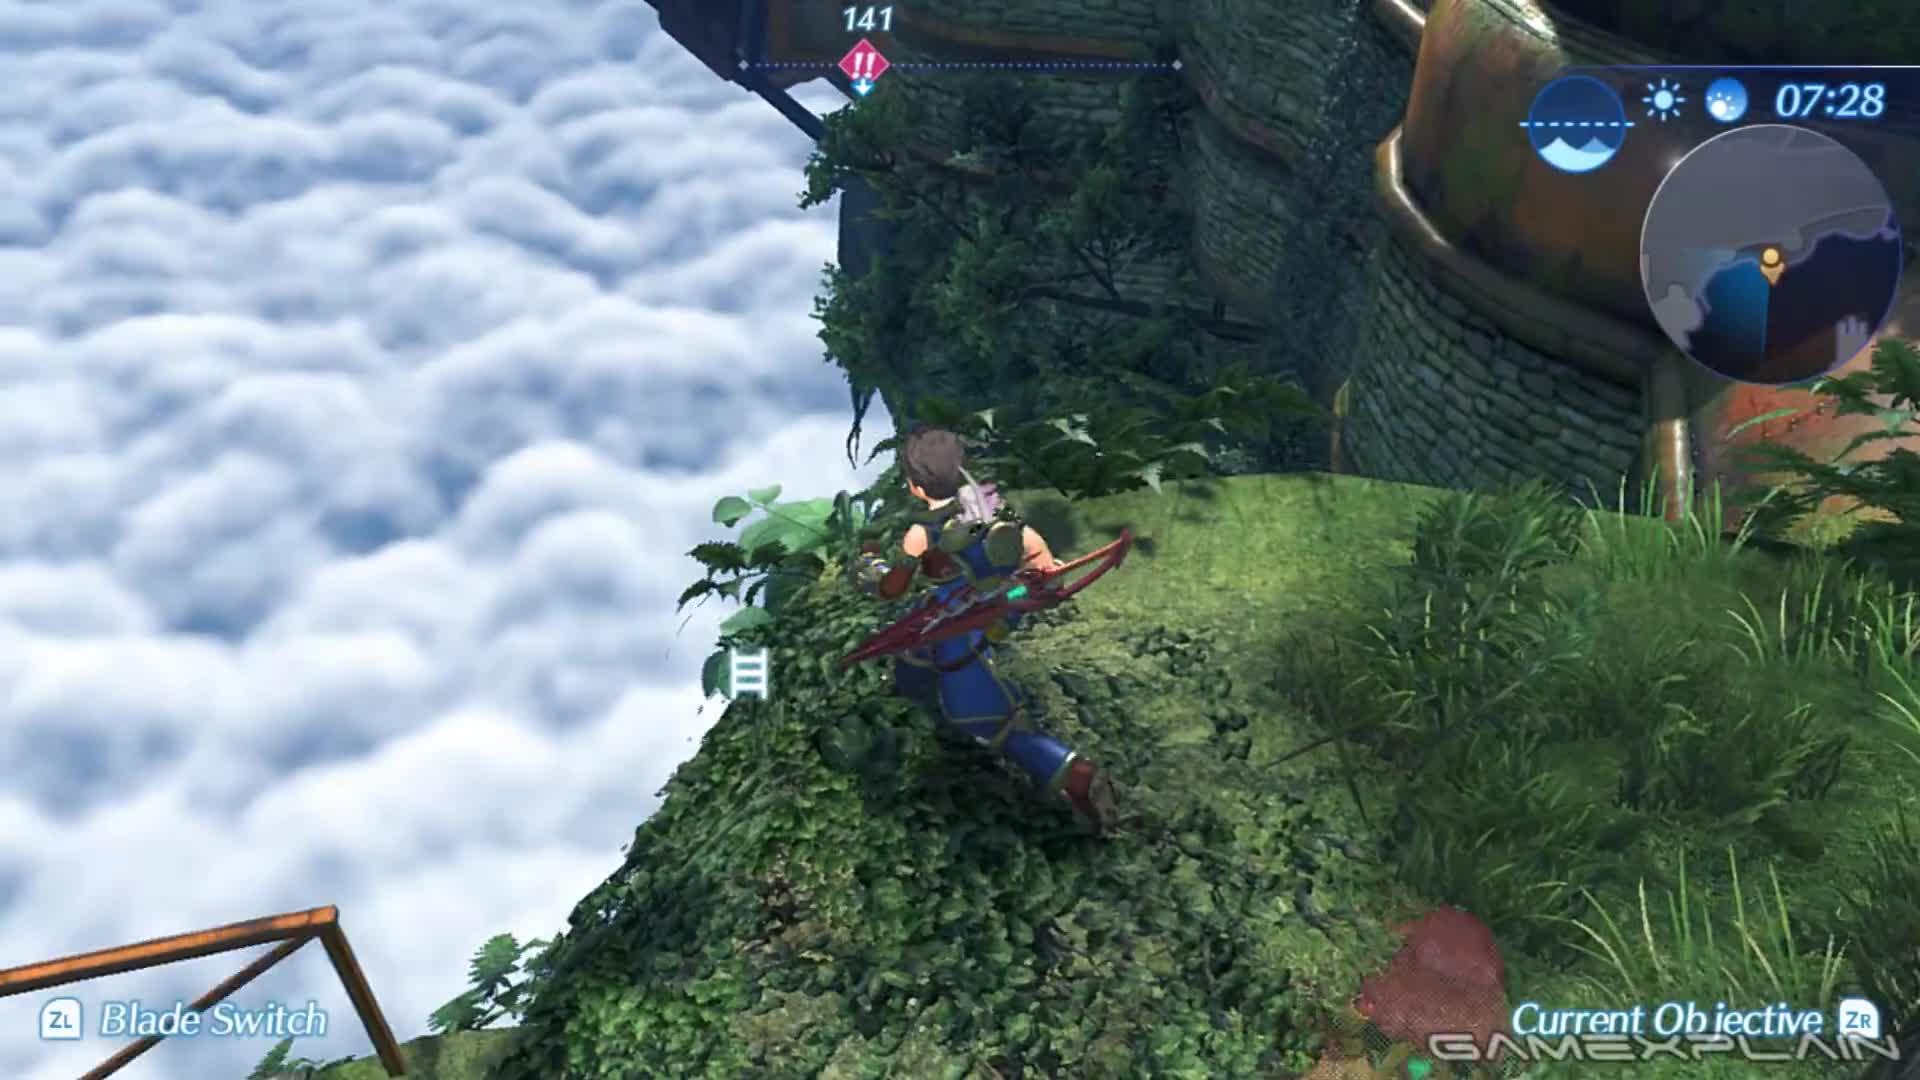 Explore, Let's Play, Nintendo, Pyra, Switch, Town, Treehouse, Xenoblade Chronicles, Xenoblade Chronicles 2, Xenoblade Chronicles X, We Play Xenoblade Chronicles 2 w/ Nintendo Treehouse (50 Minutes of Gameplay!) GIFs